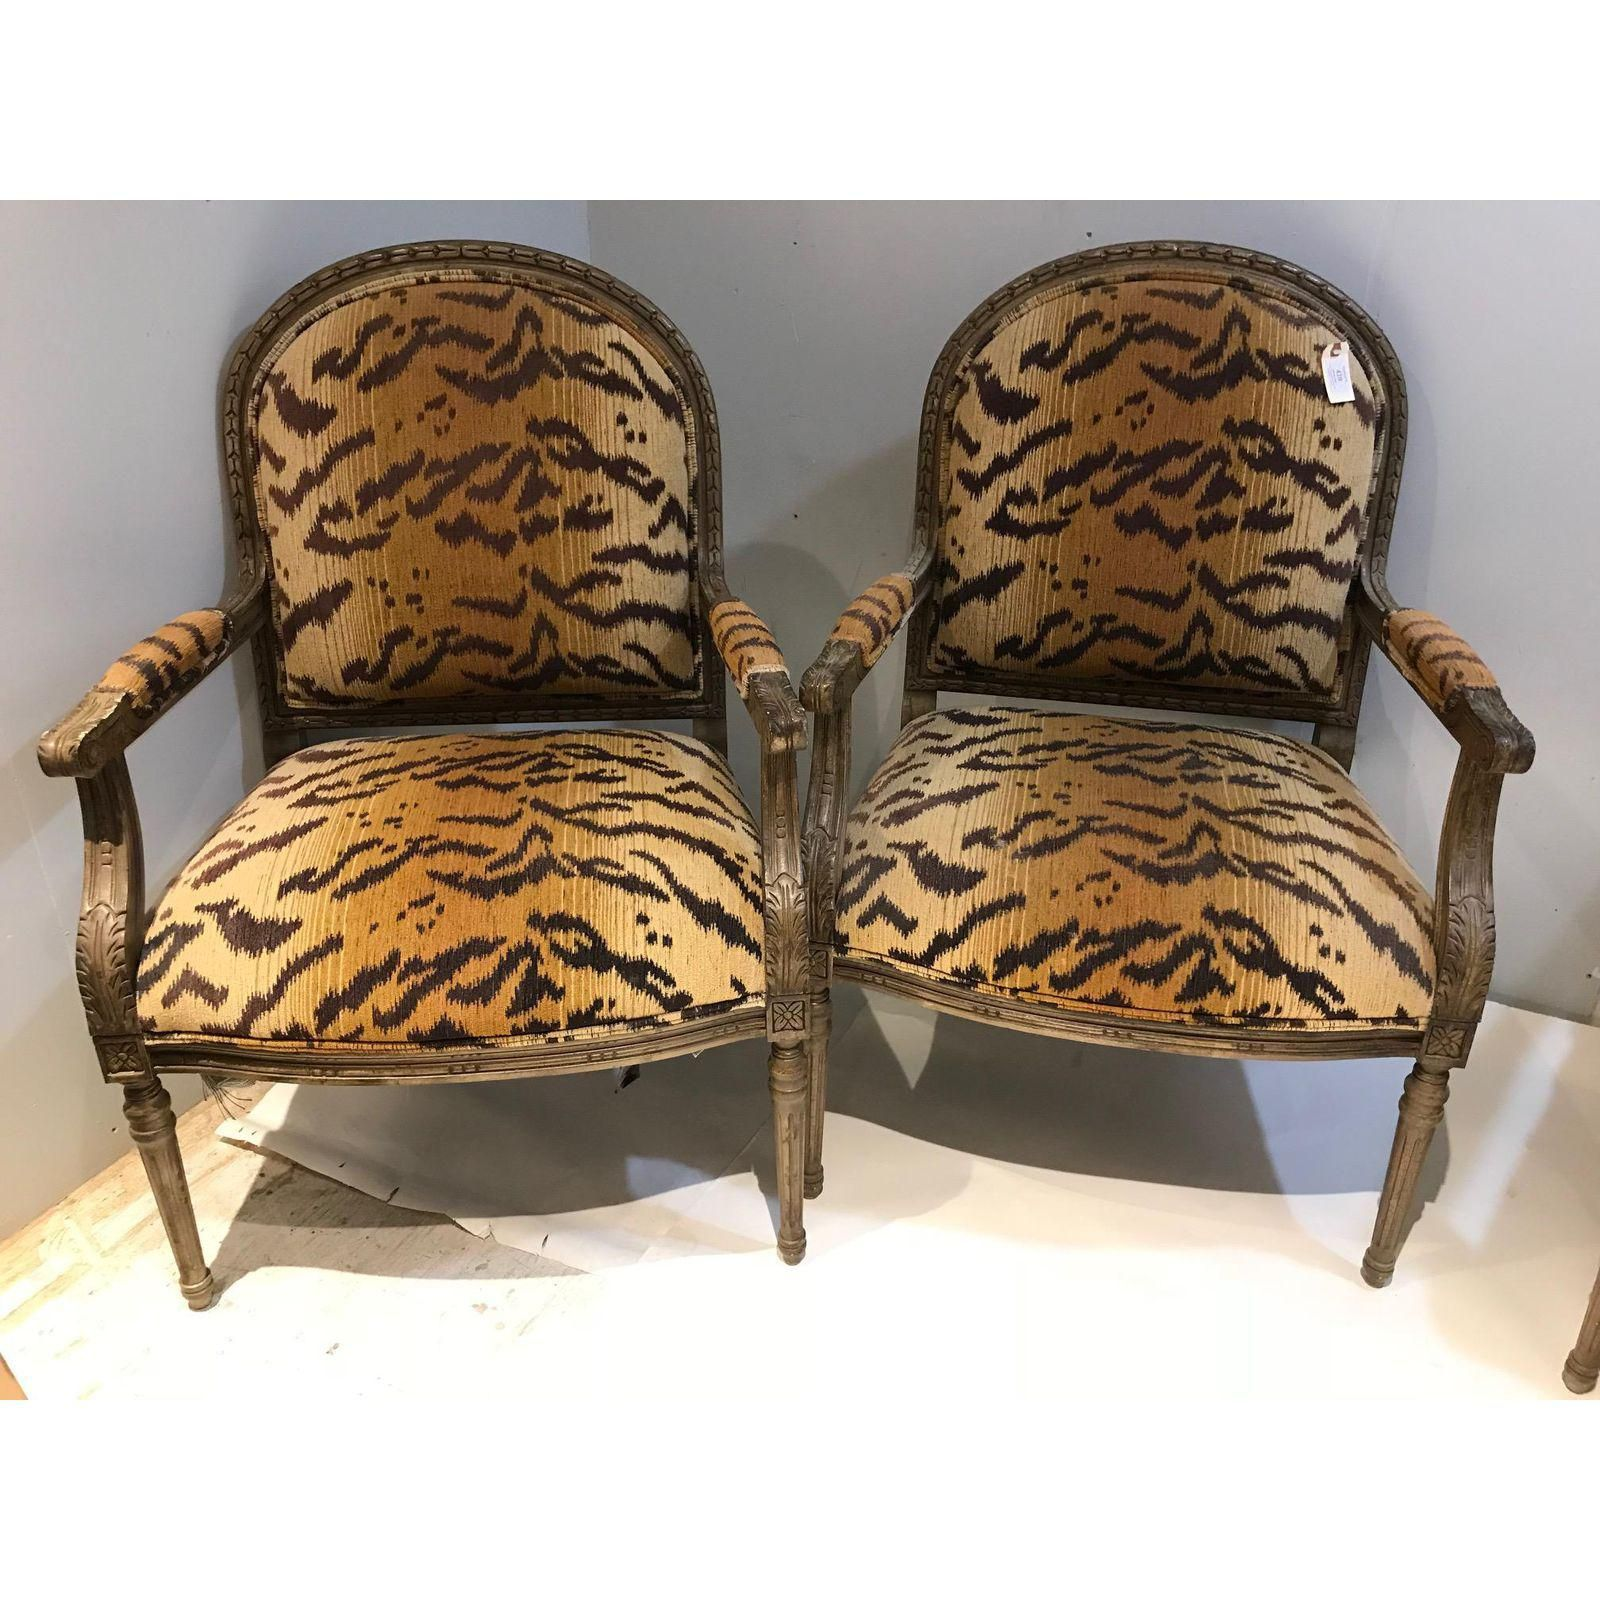 Vintage Henredon Tiger Print Chairs Set Of 4 Chic Living Room Chair Printed Chair #printed #living #room #chairs